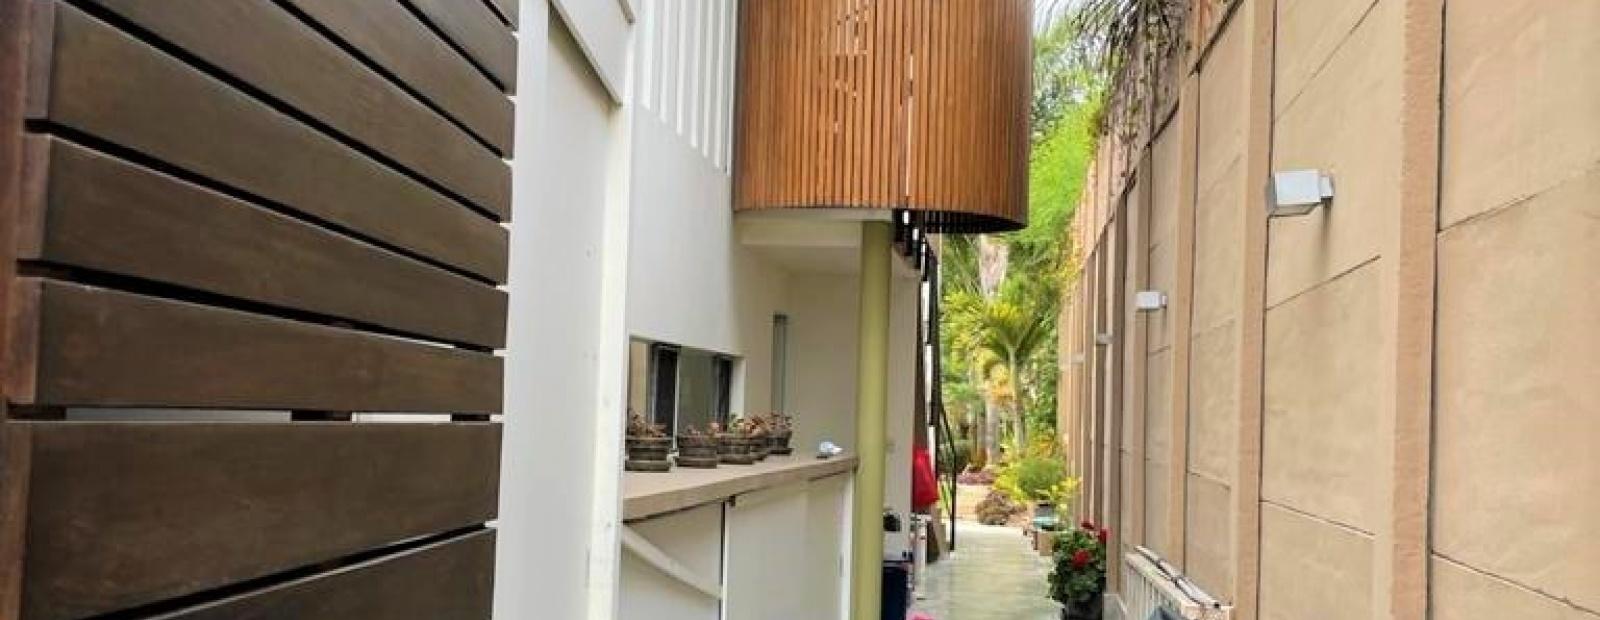 Alameda Marquez de la Bula, Surco, 3 Habitaciones Habitaciones,6 BañoBaño,Casa,Venta,Alameda Marquez de la Bula,C-1051